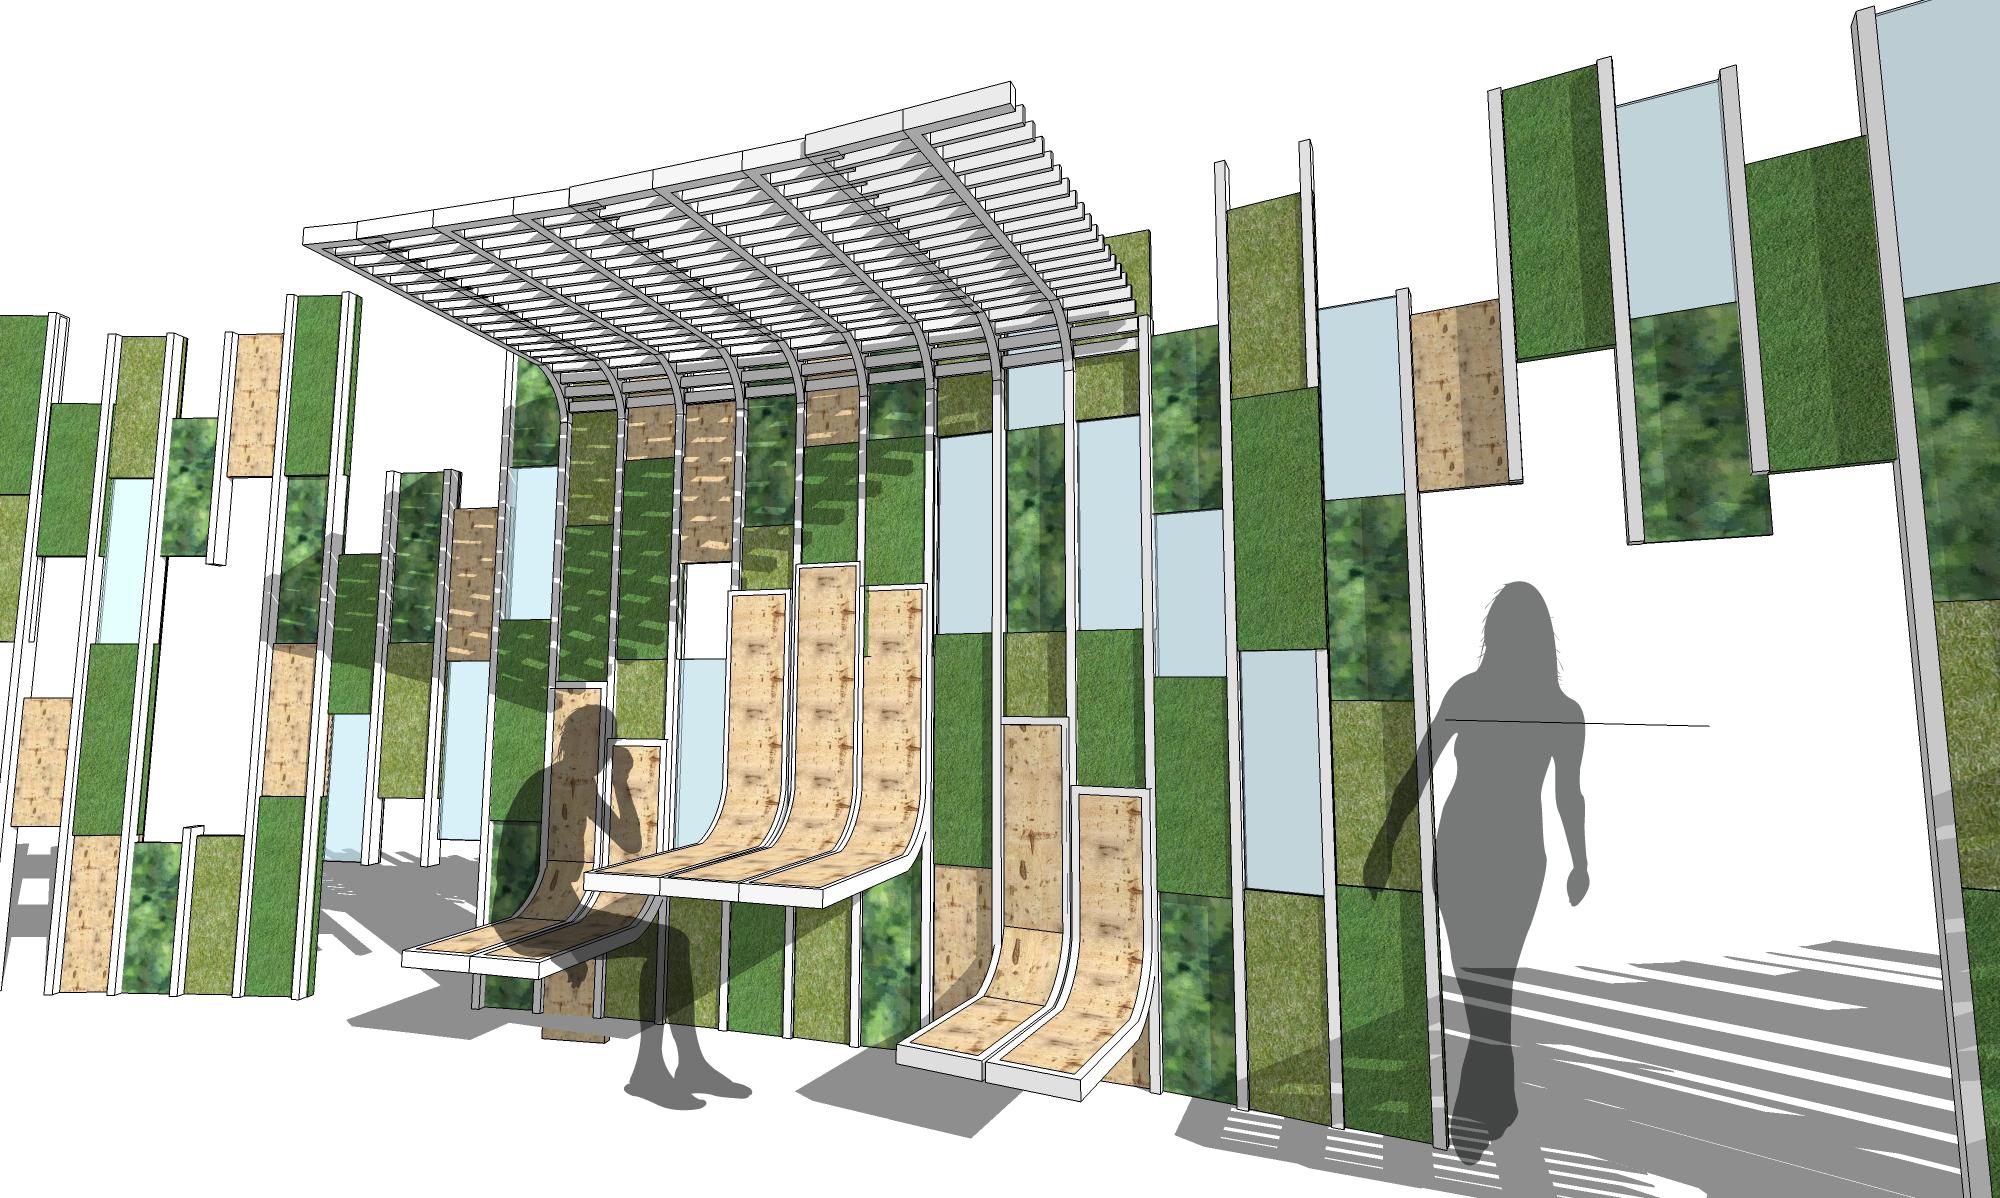 Urban Design Furniture gallery of waterfront furniture / alo design - 7